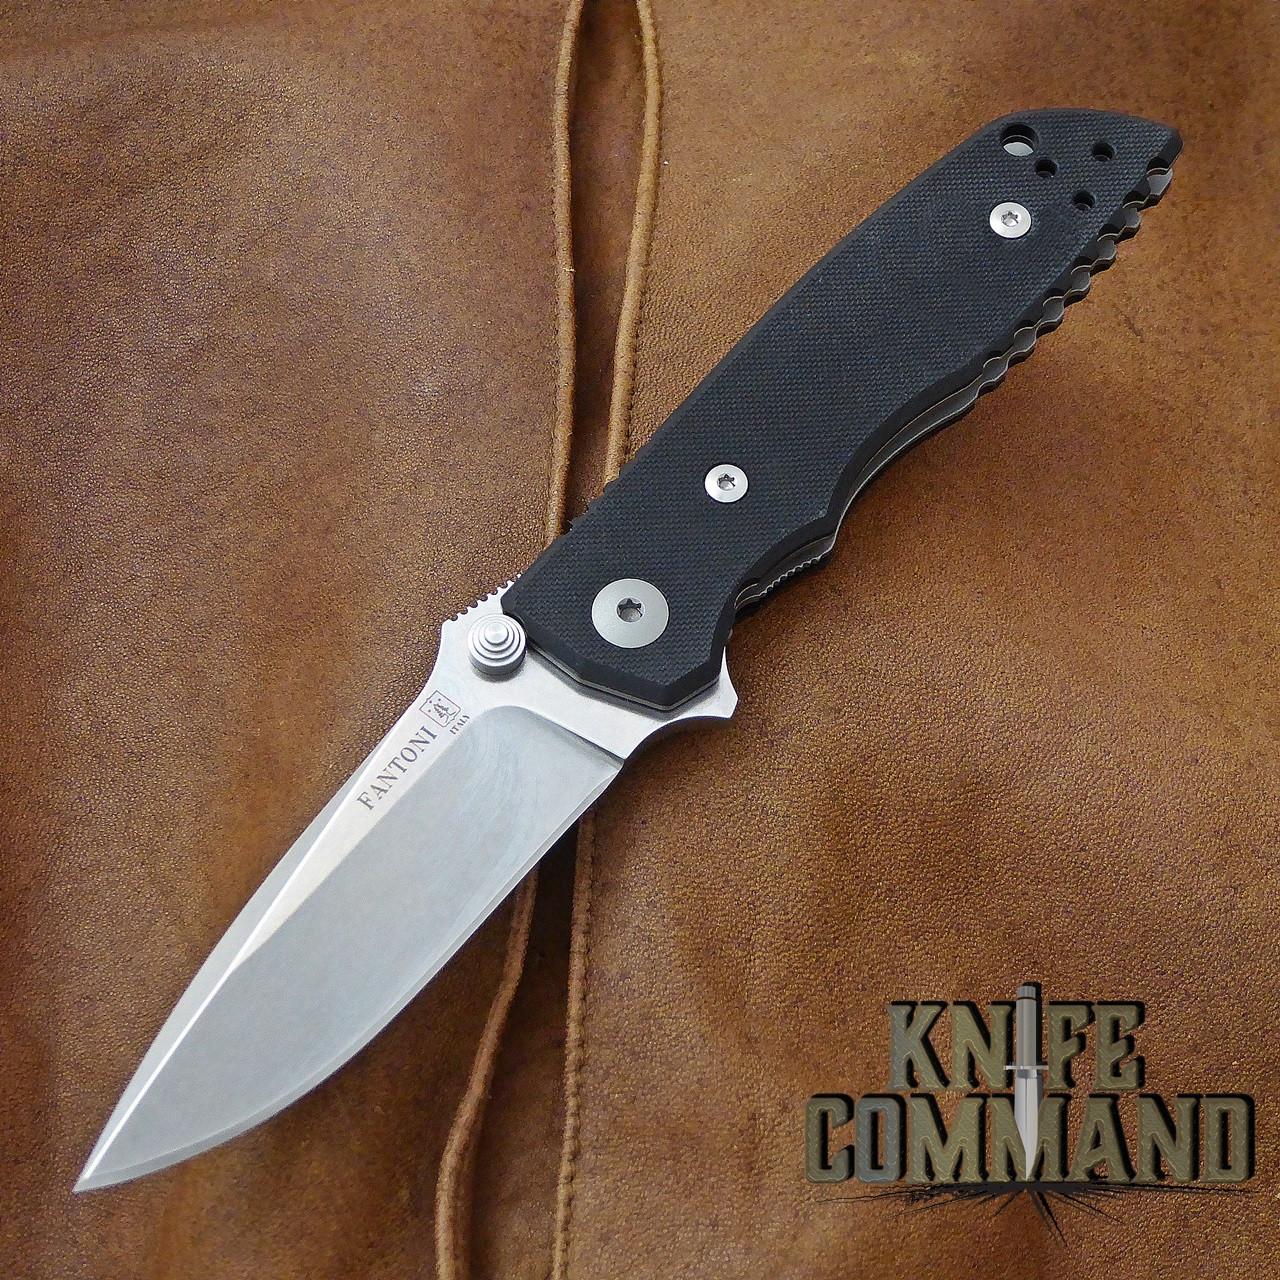 Fantoni HB 03 M390 William Harsey Combat Folder Tactical Knife Black.  Bohler M390 Microclean stainless steel blade.